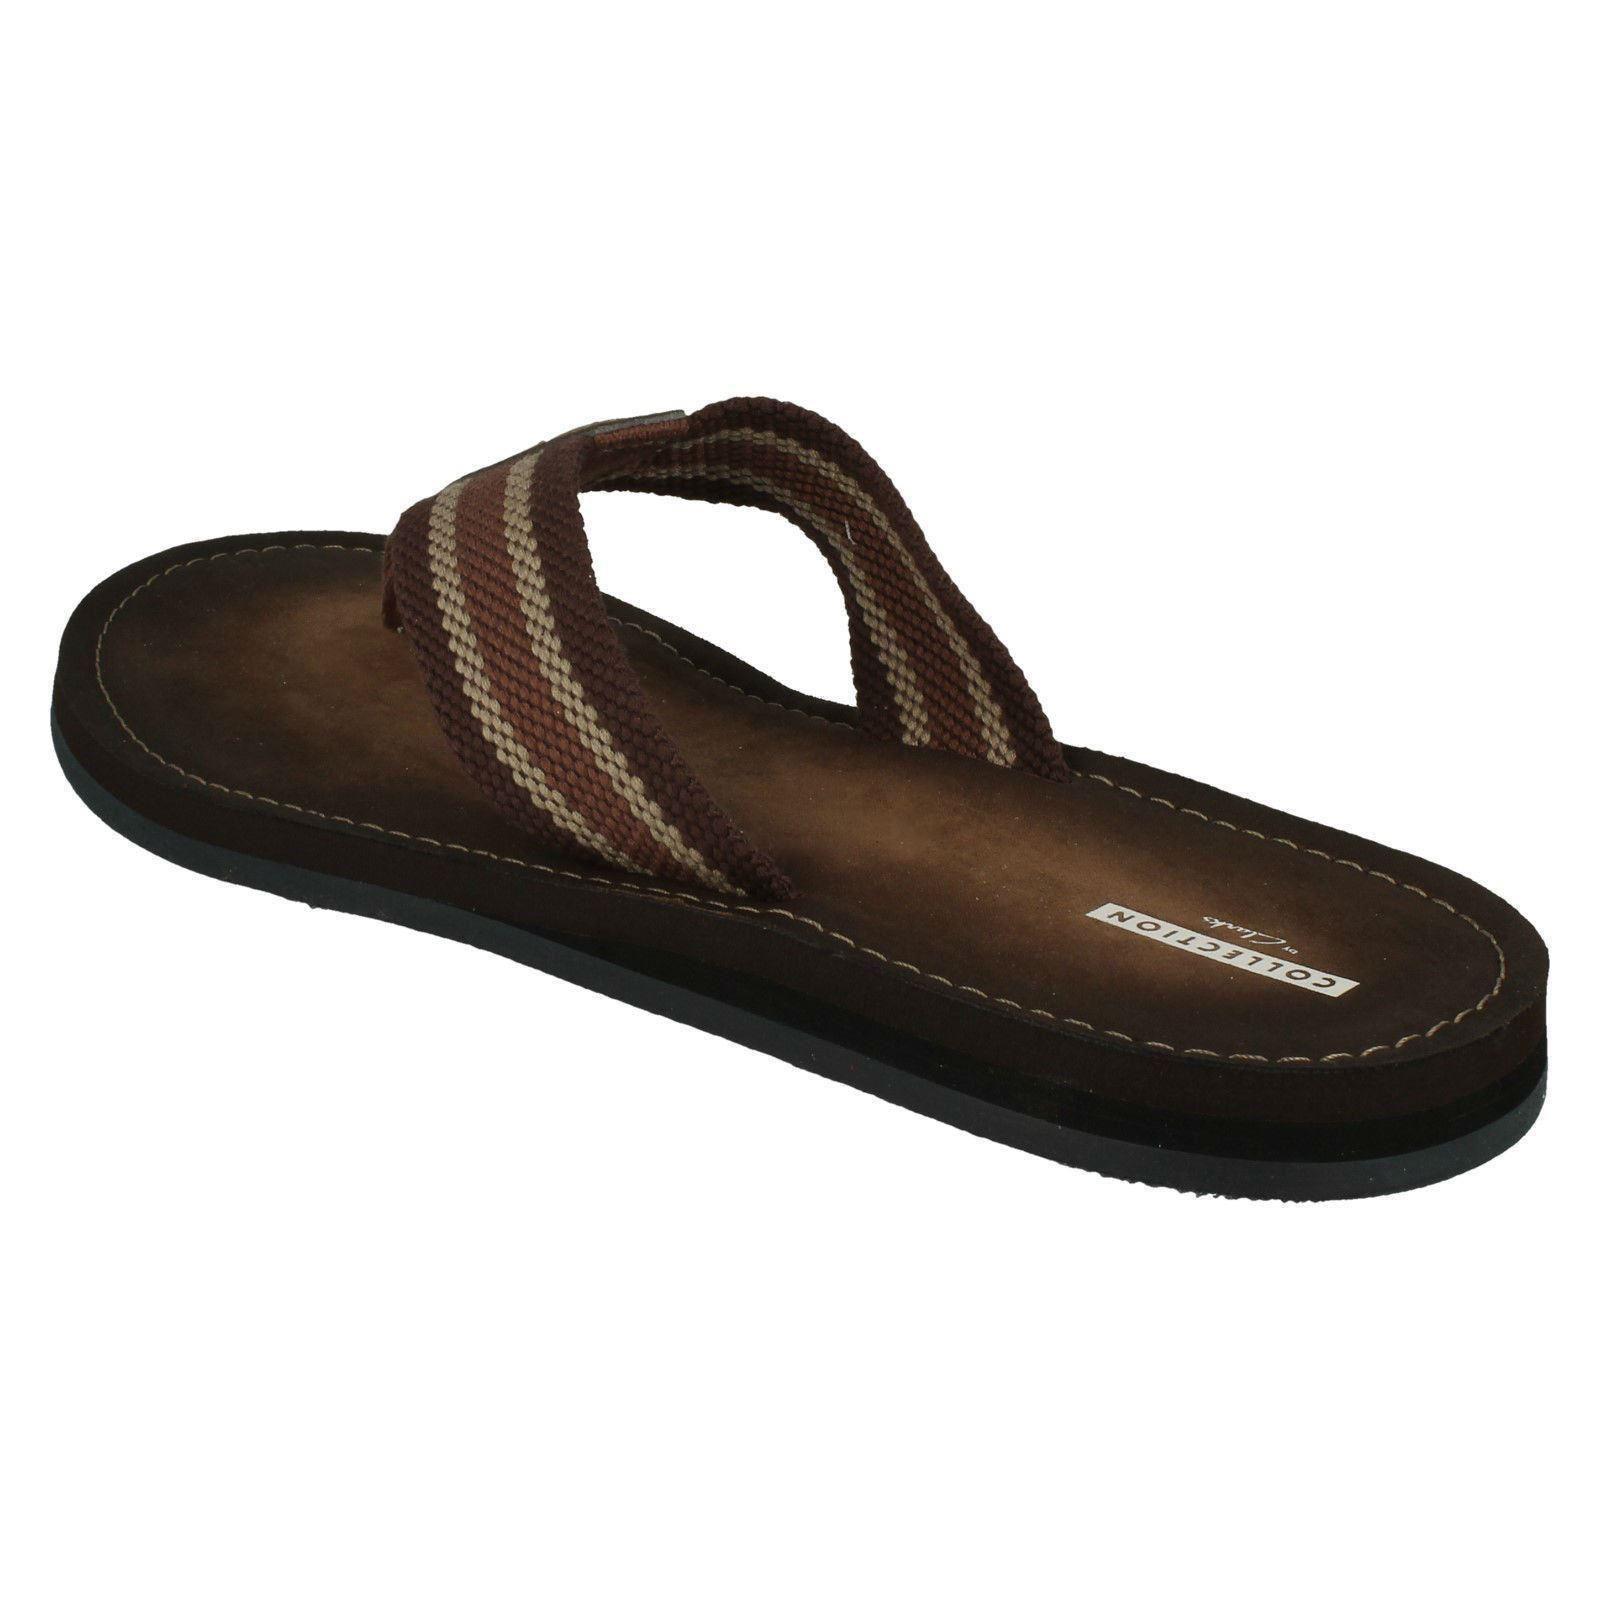 Brown Clarks eleganti Mens con Lacono sandali Sun punta WwnOqdg0pd